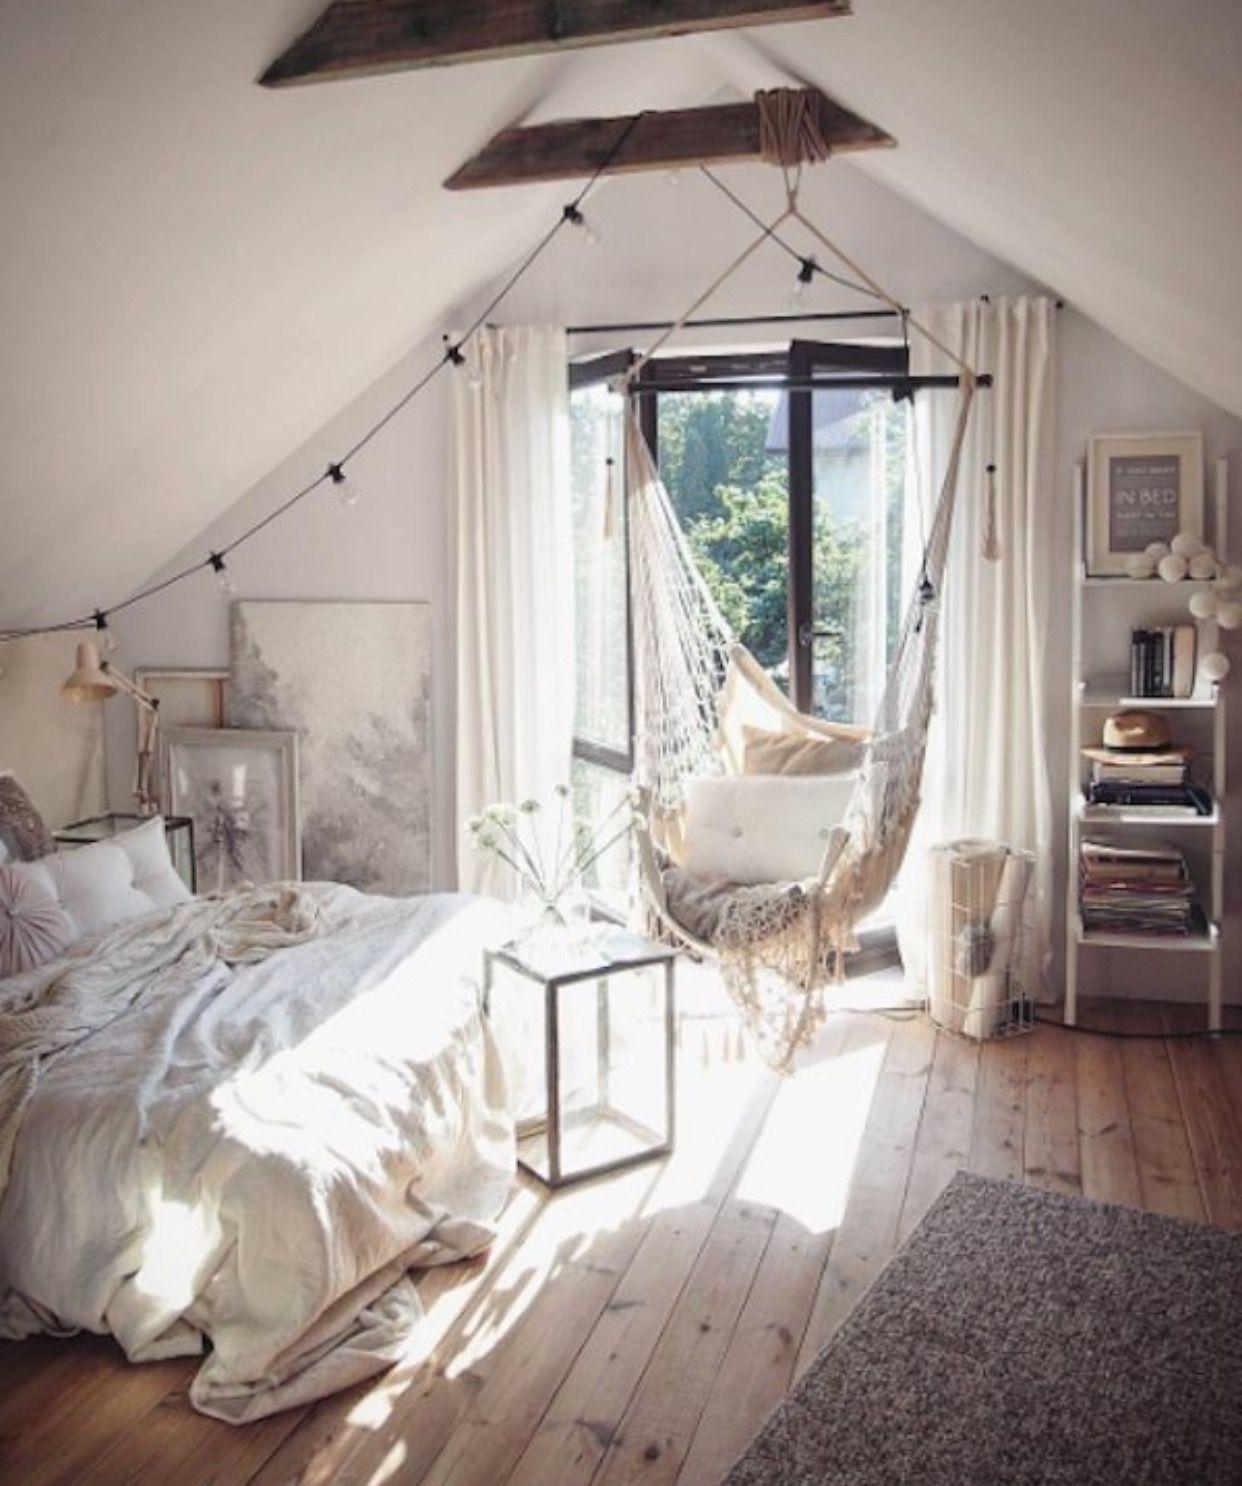 Pin by patricia weißgräber on bedroom pinterest bedrooms